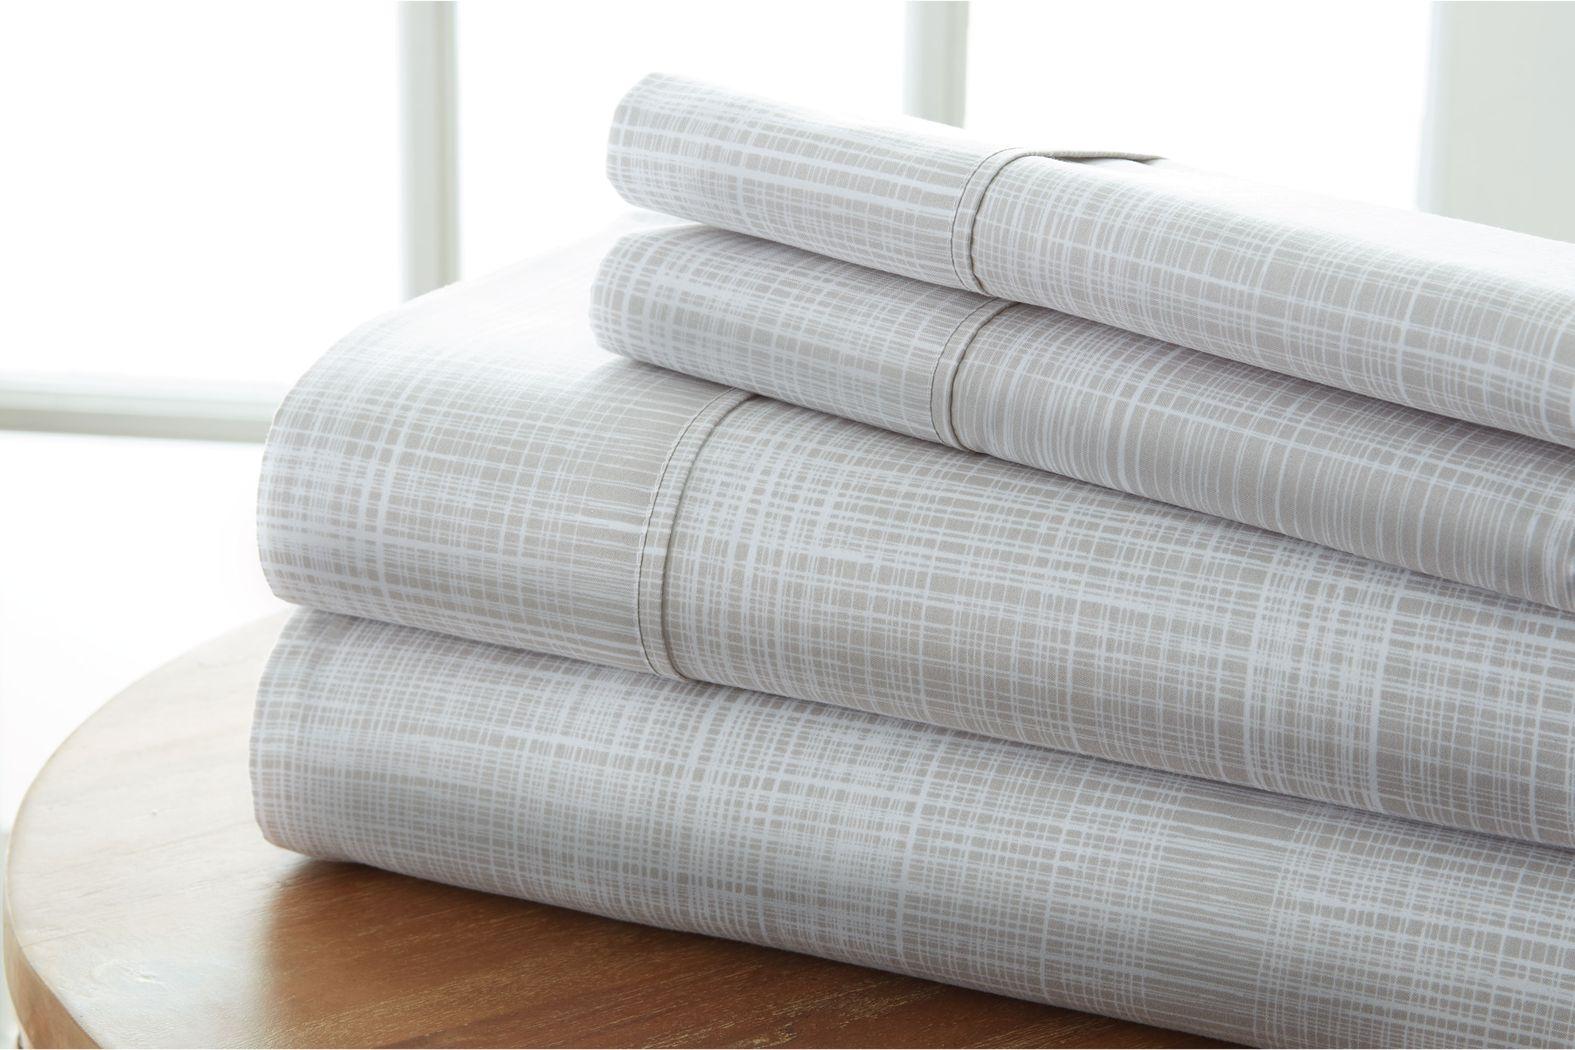 Belden Landing IX Gray 4 Pc King Bed Sheet Set